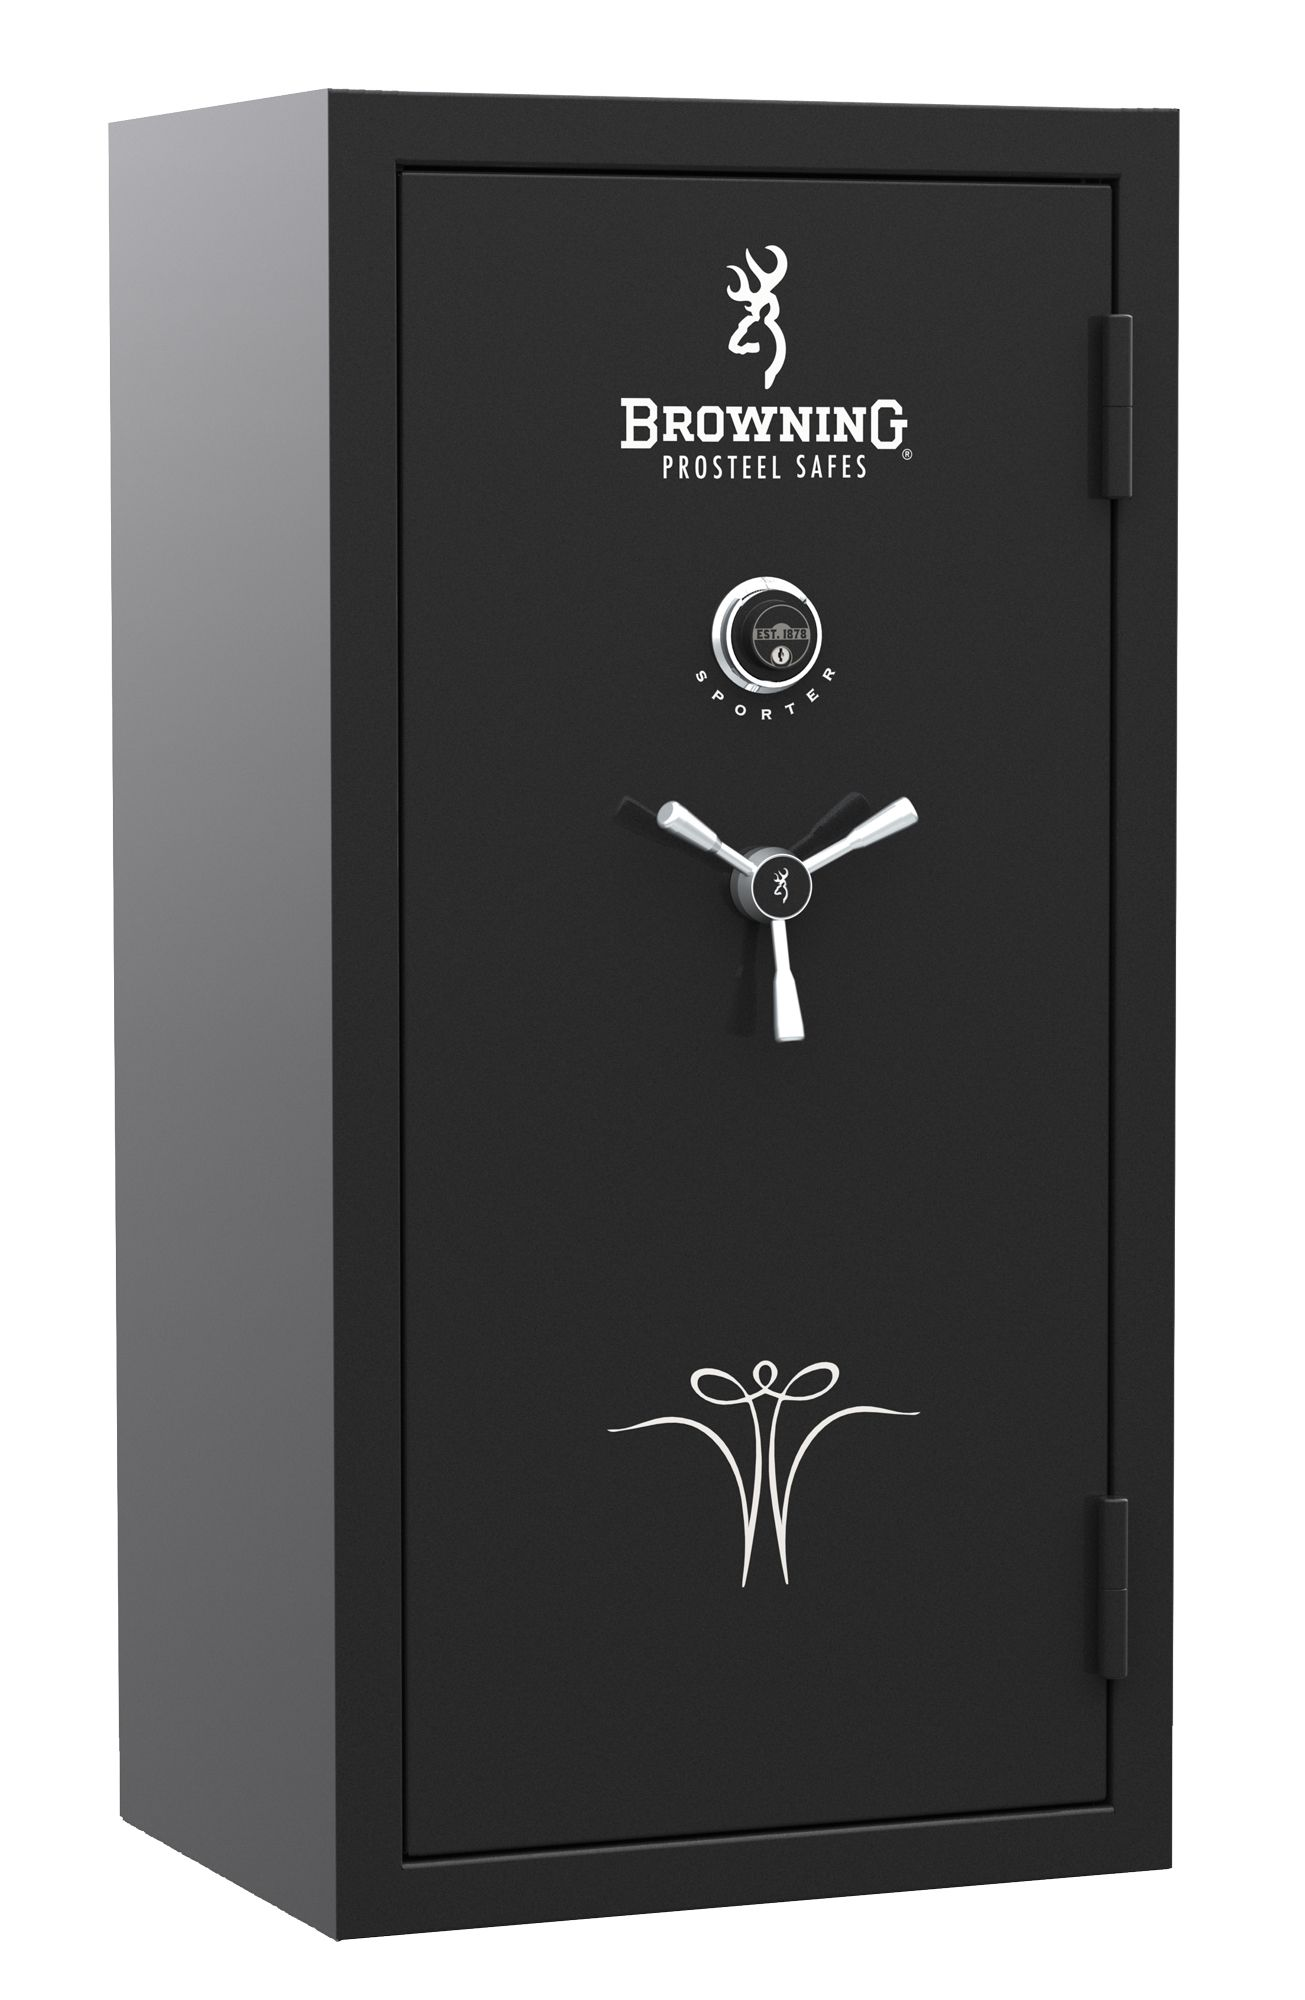 Product Image · Browning Sporter SP23 25 Gun Mechanical Lock Fire Safe